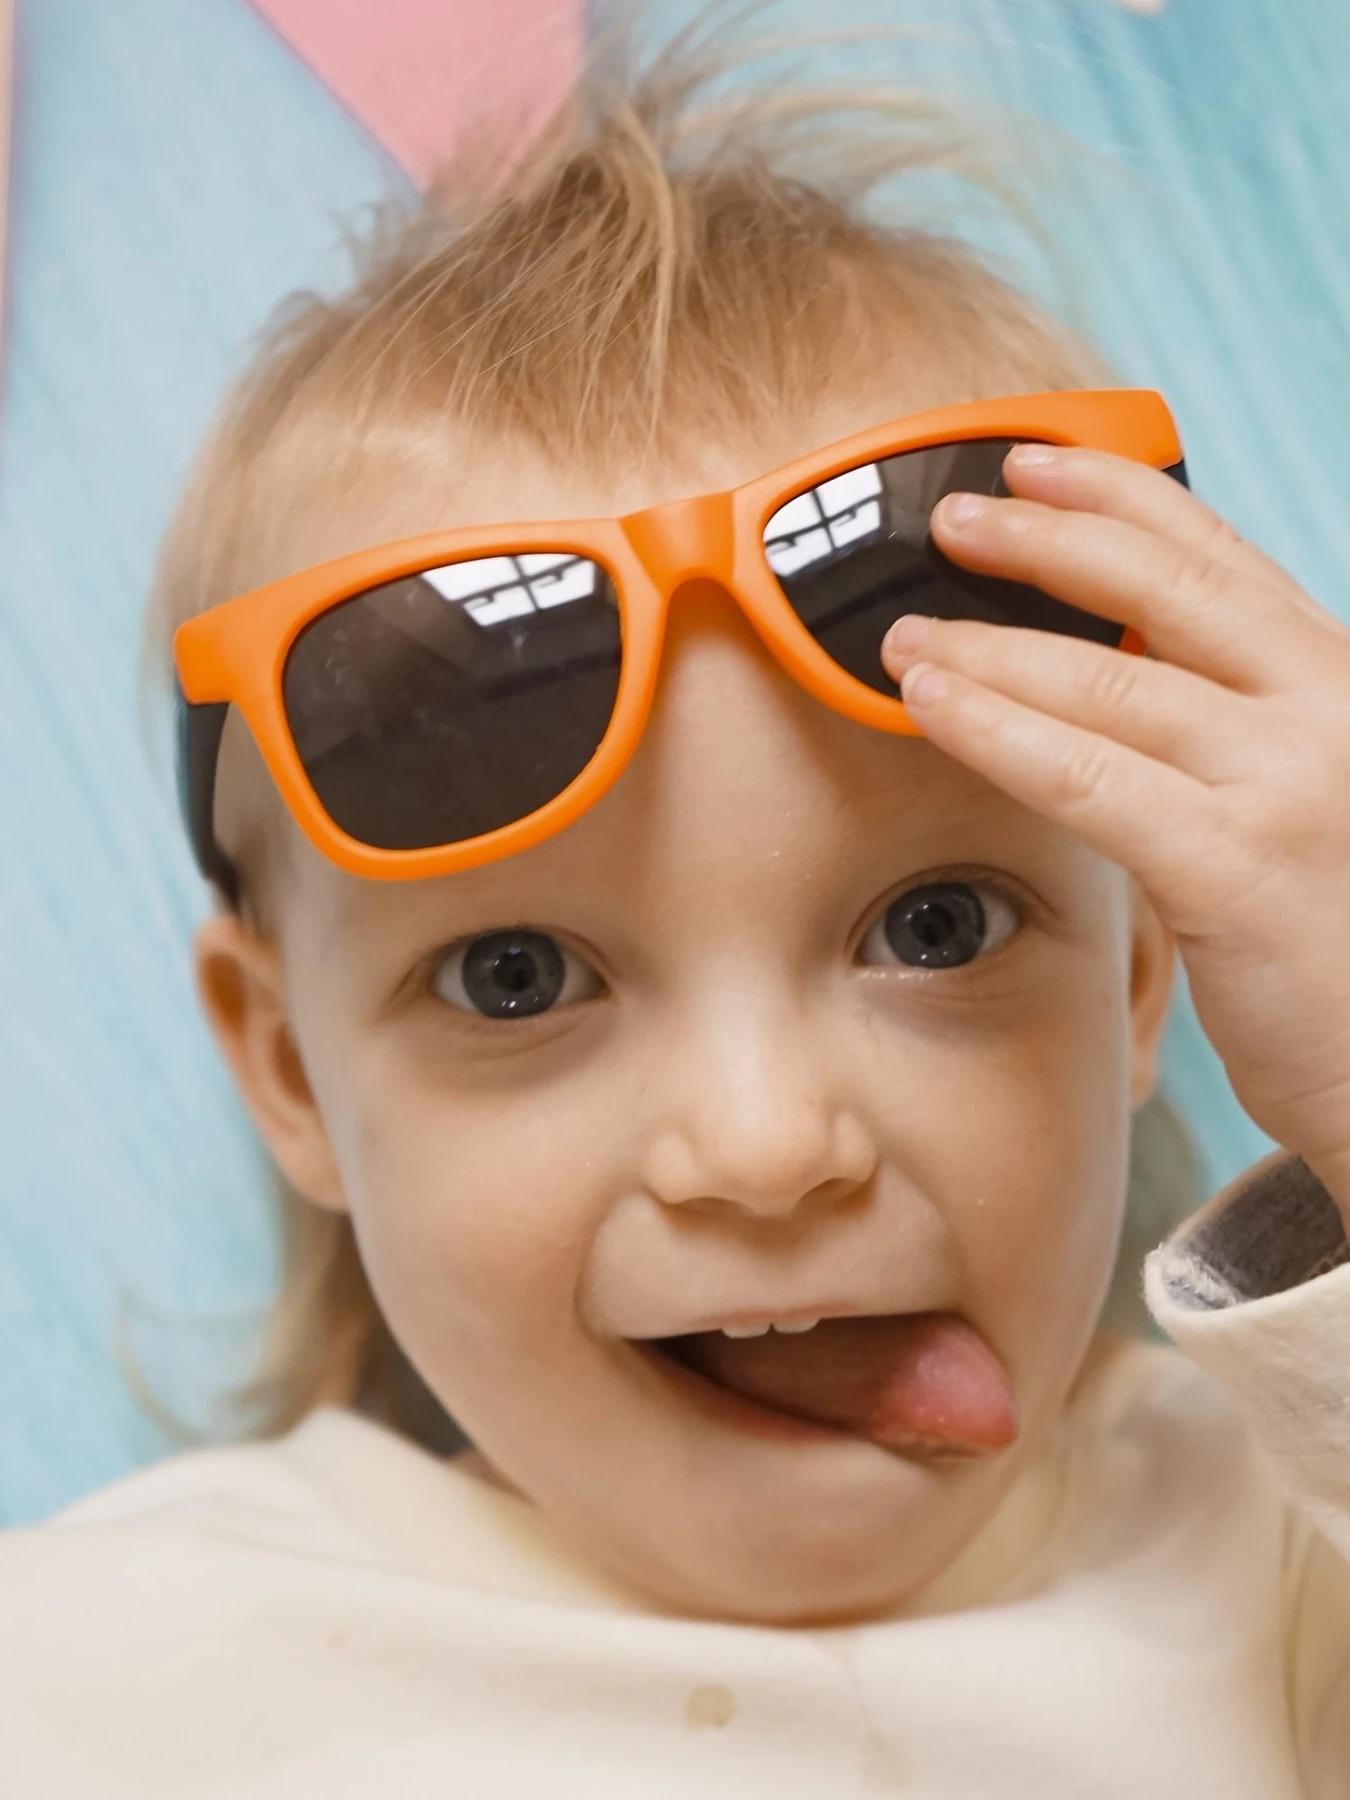 orange_and_black_sunglasses_4240de54-4ae3-4235-b48a-c7ff48126f17_1800x1800